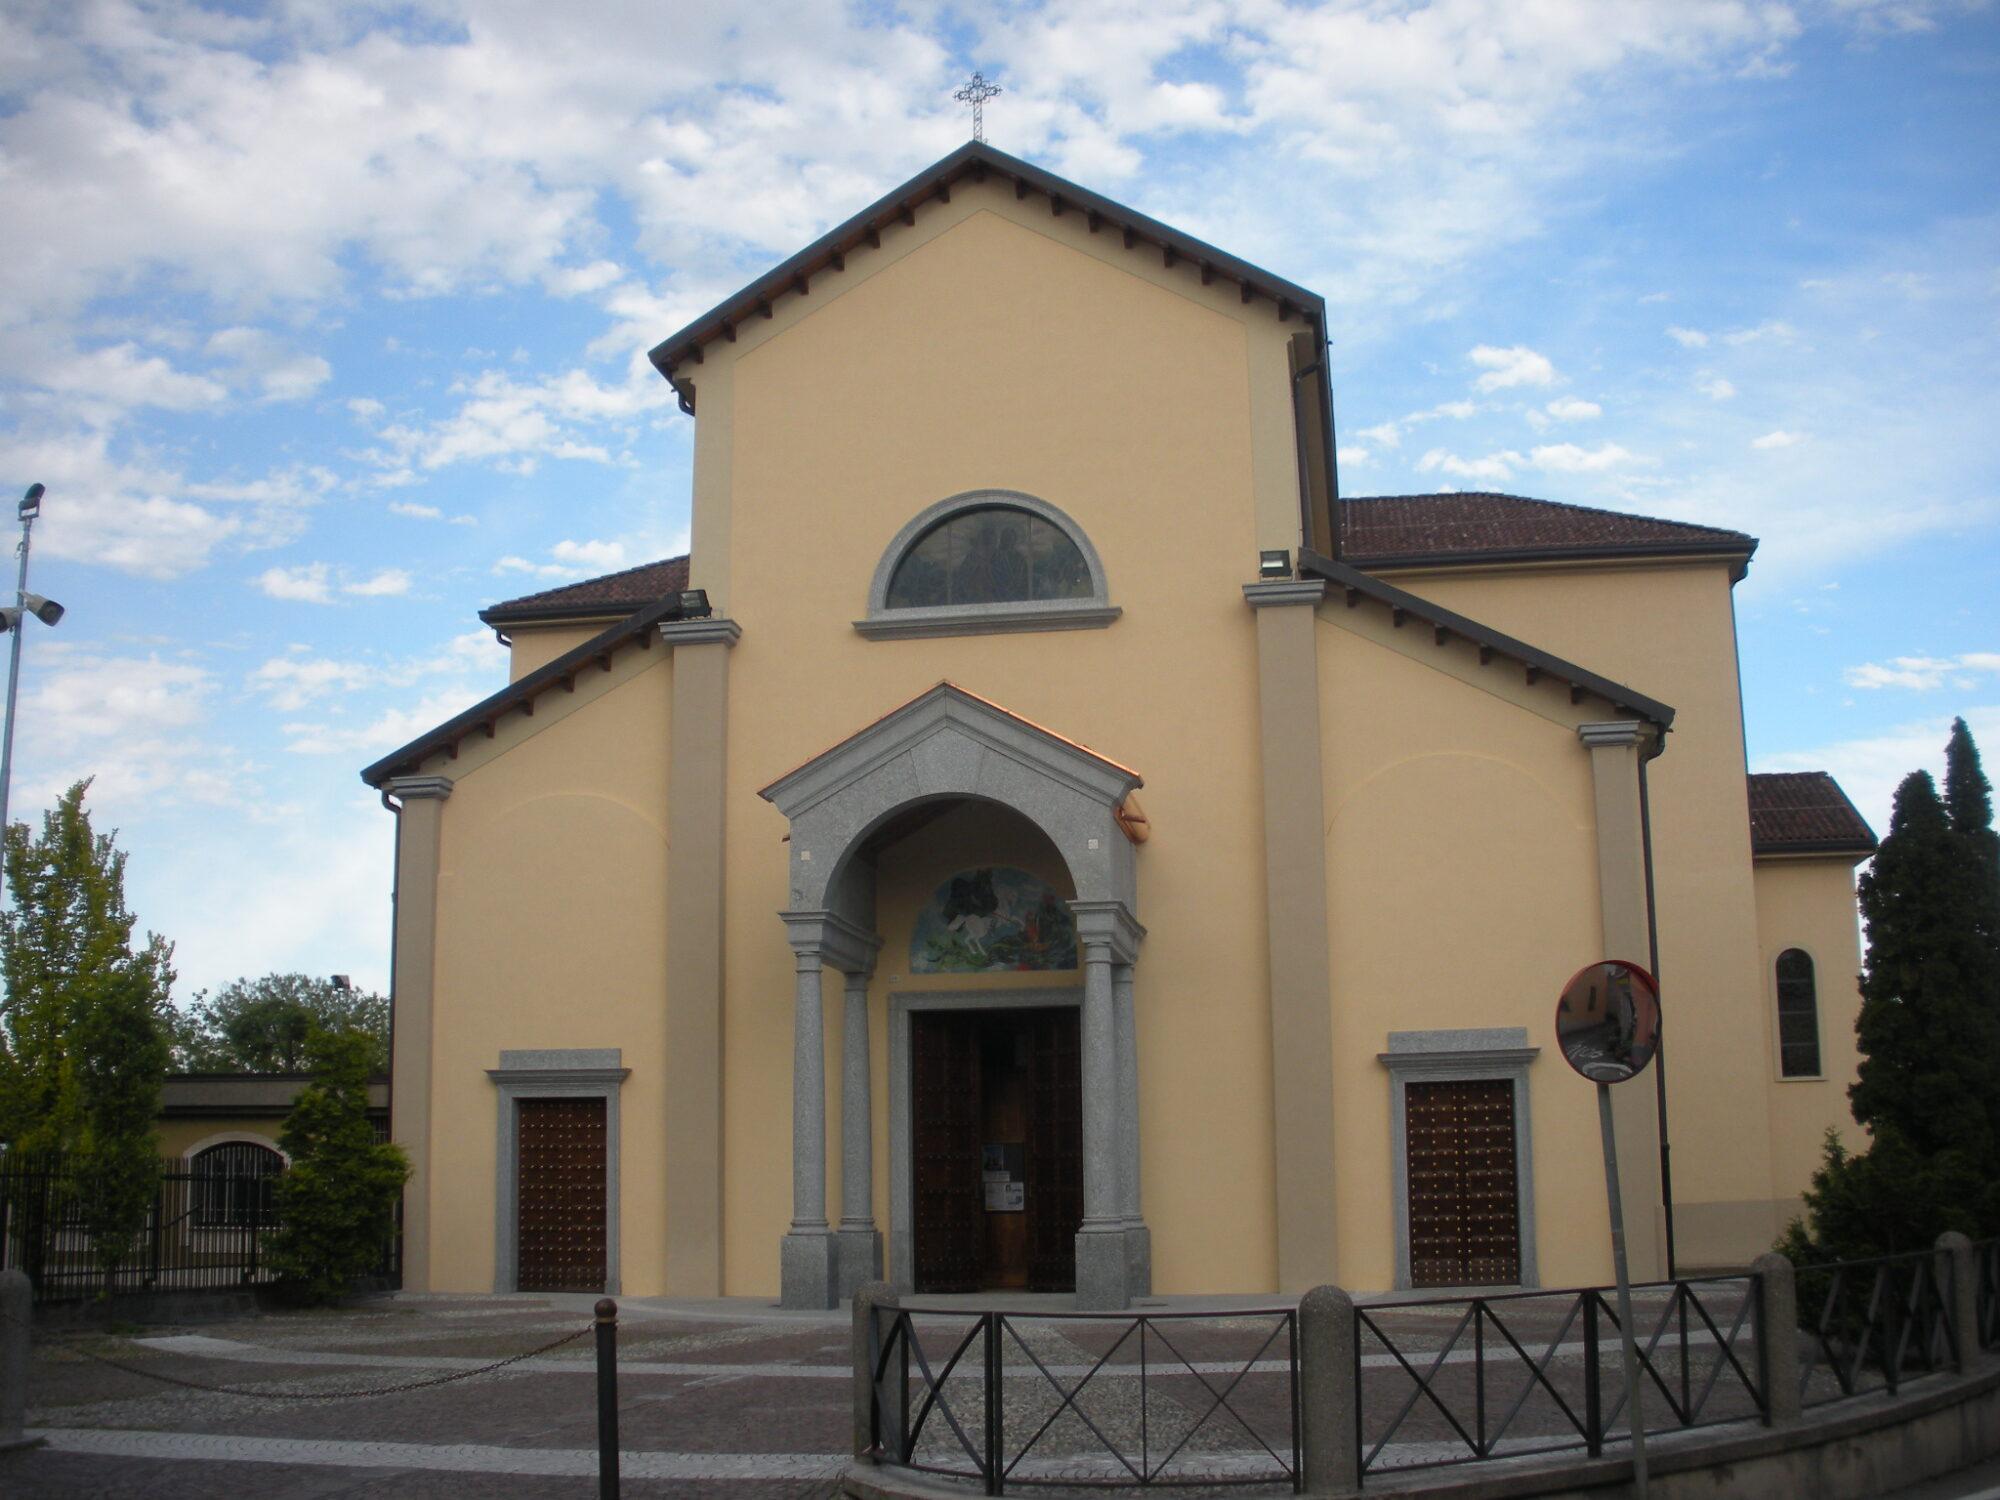 Parrocchia San giorgio